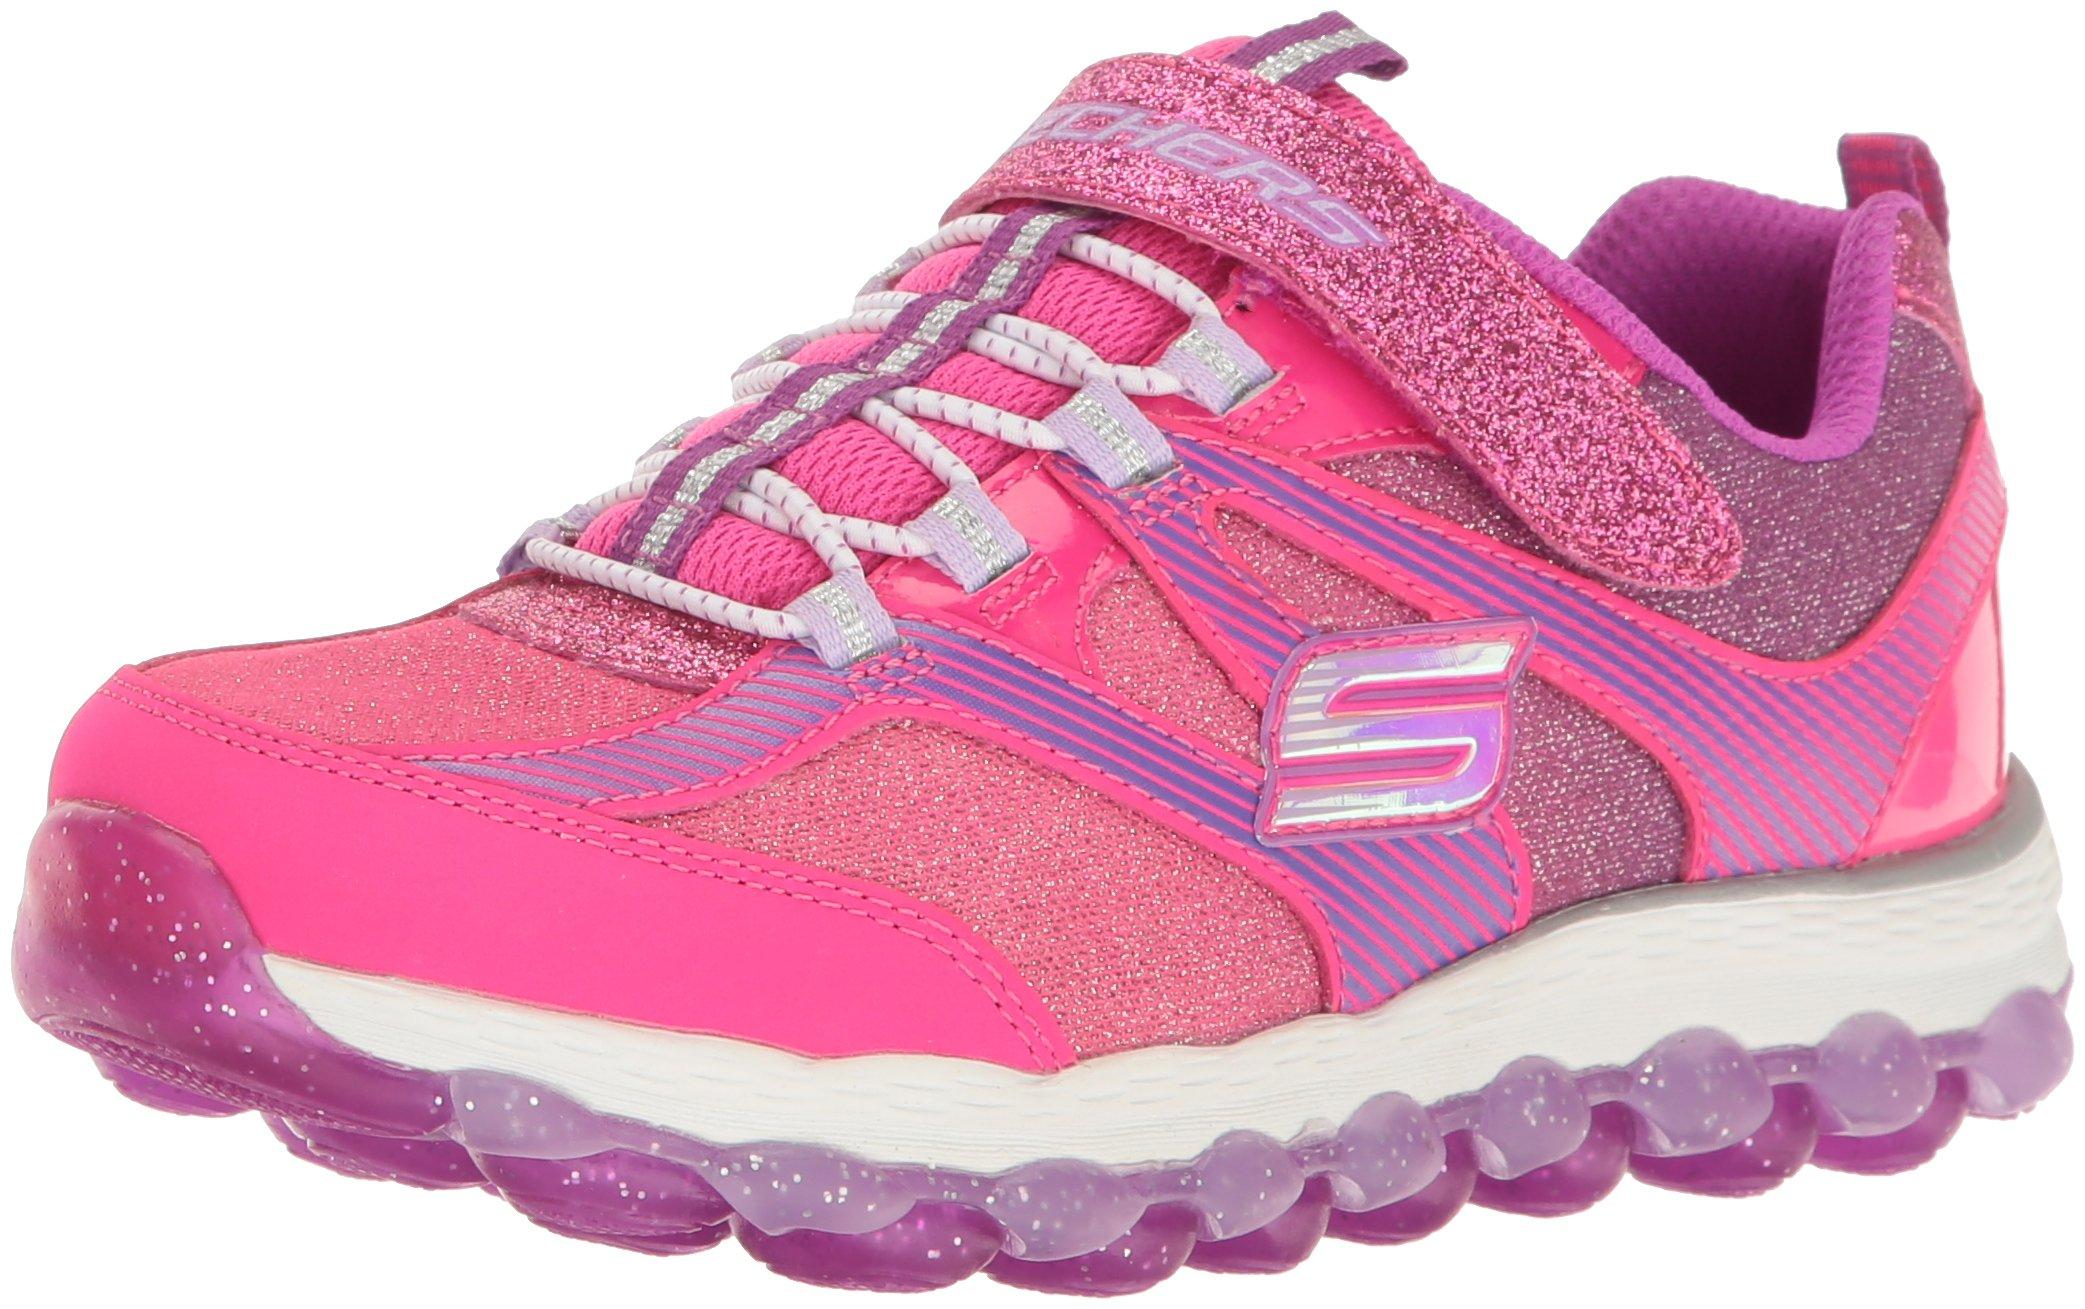 official photos 765a7 506cd Galleon - Skechers Kids Girls  Skech-Air Ultra-Glam It Up Running Shoe,Neon  Pink Purple,